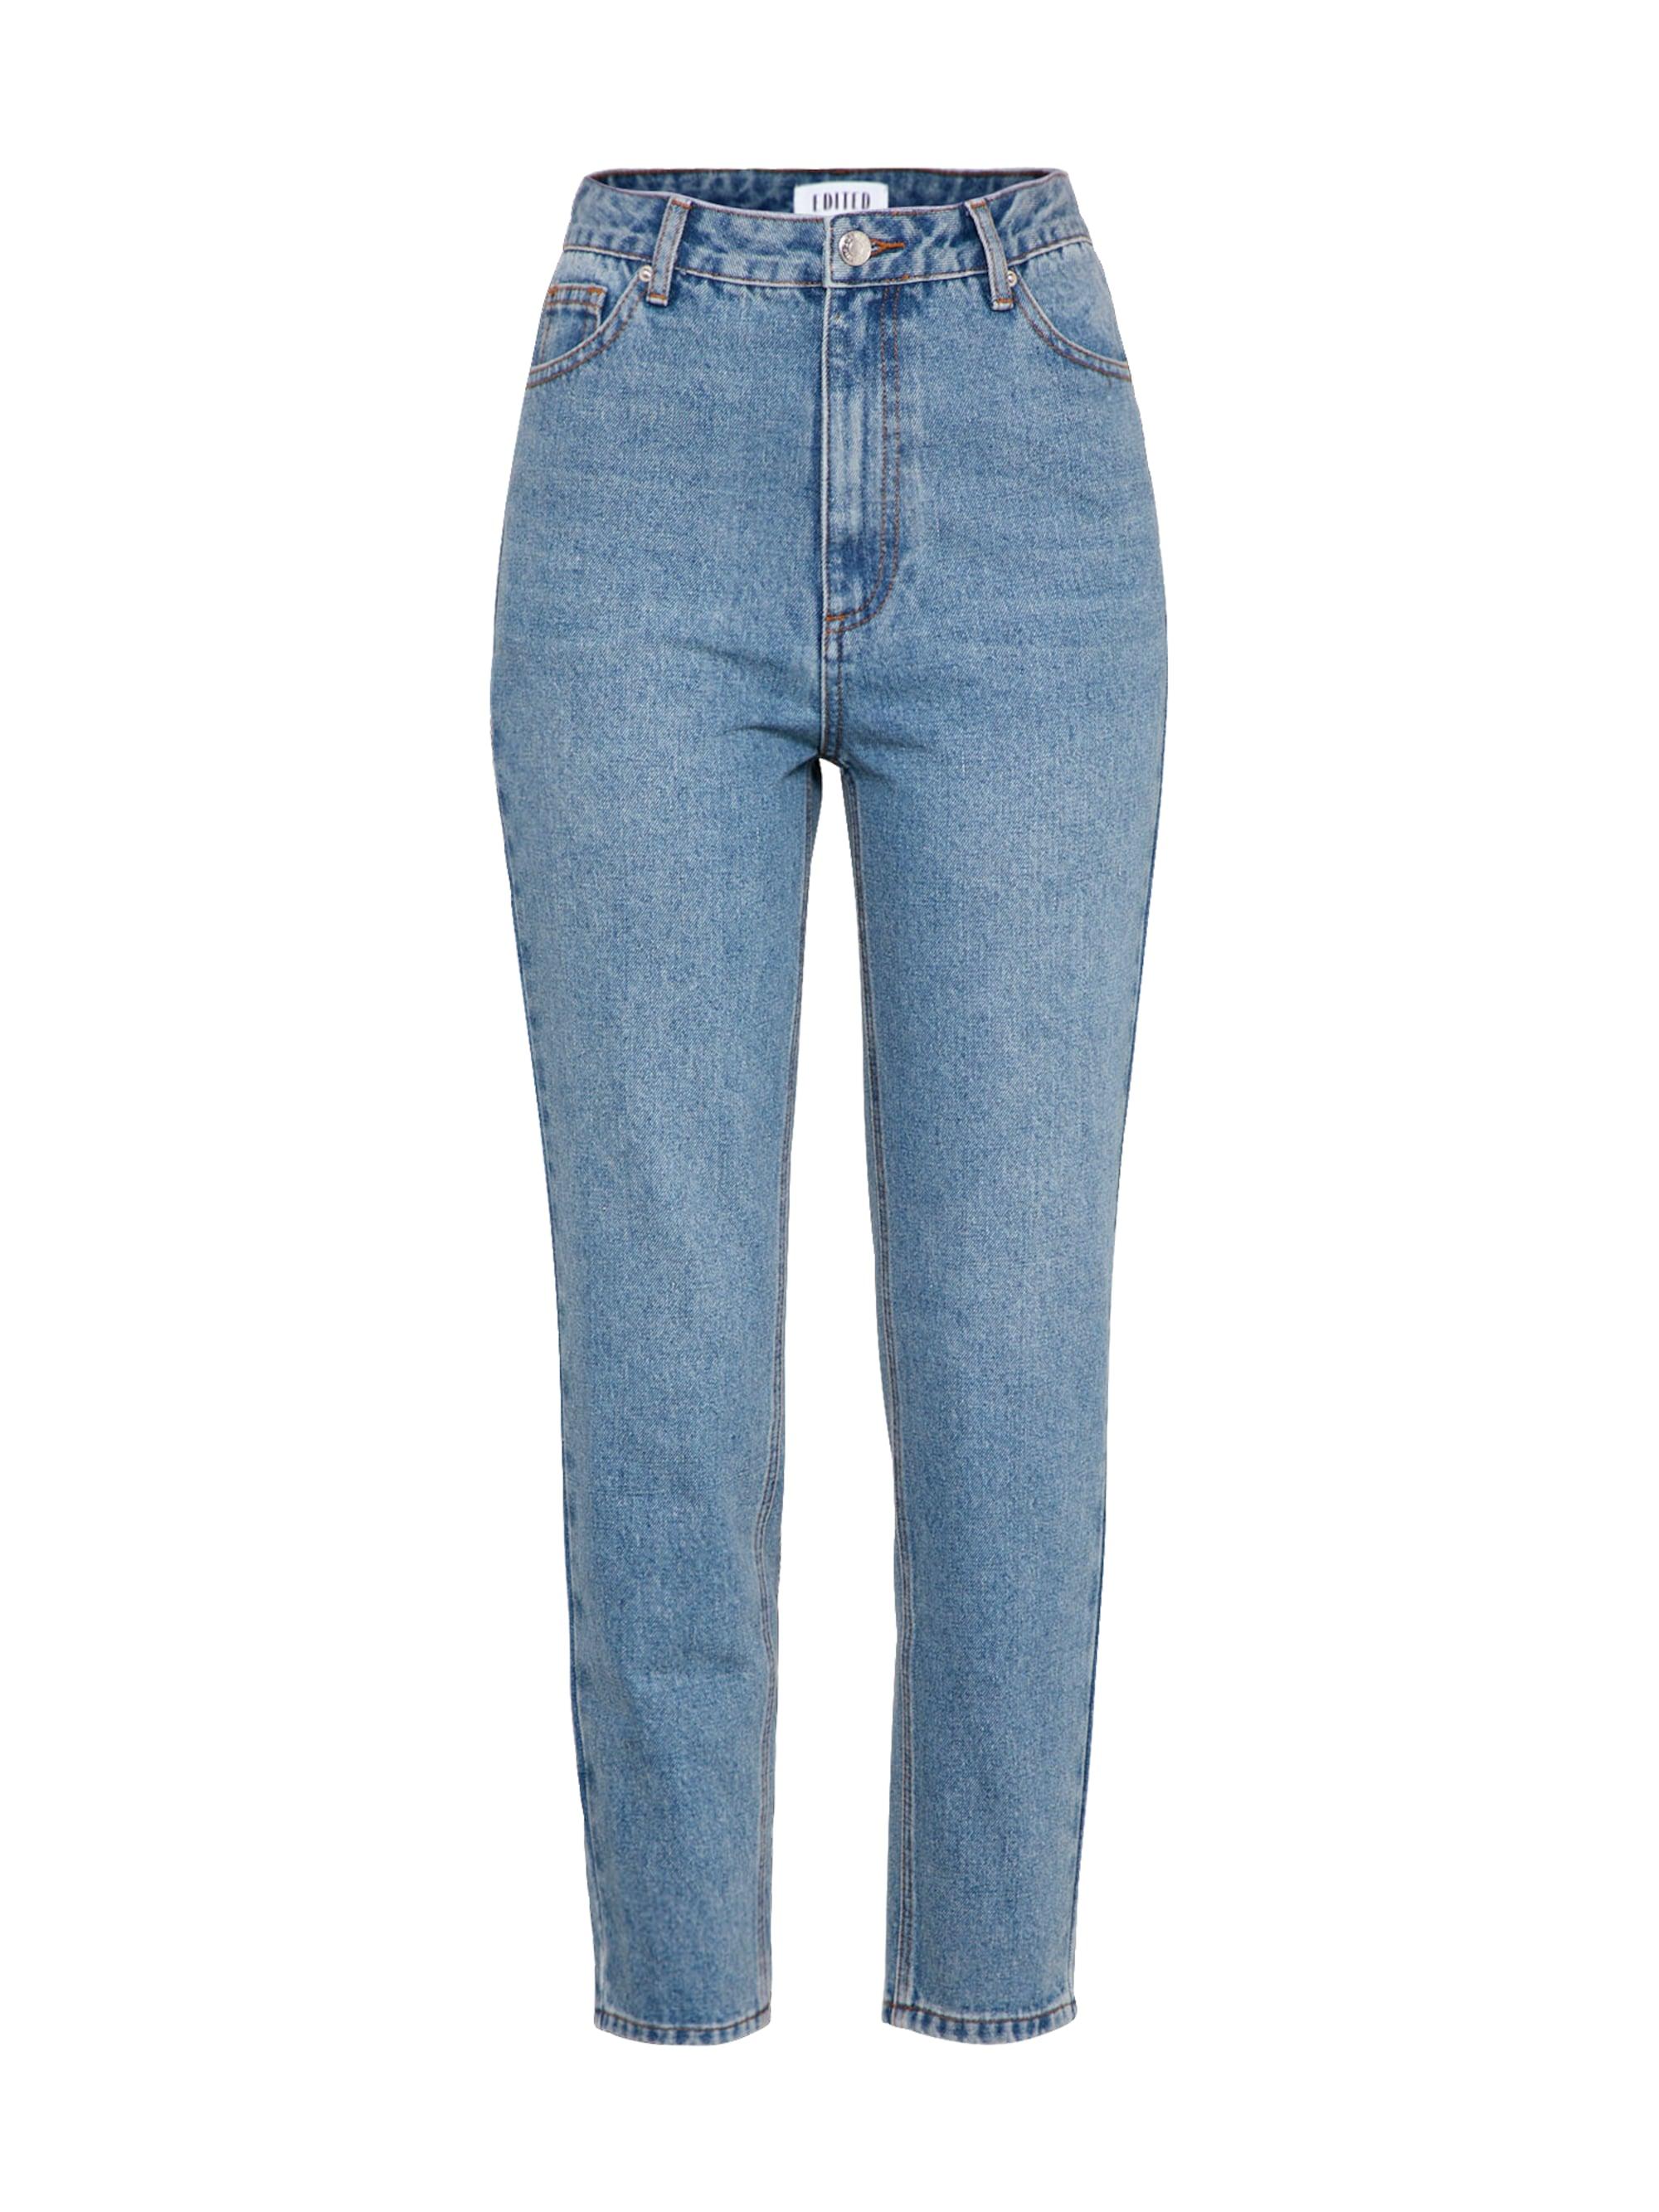 Jeans 'Moa'